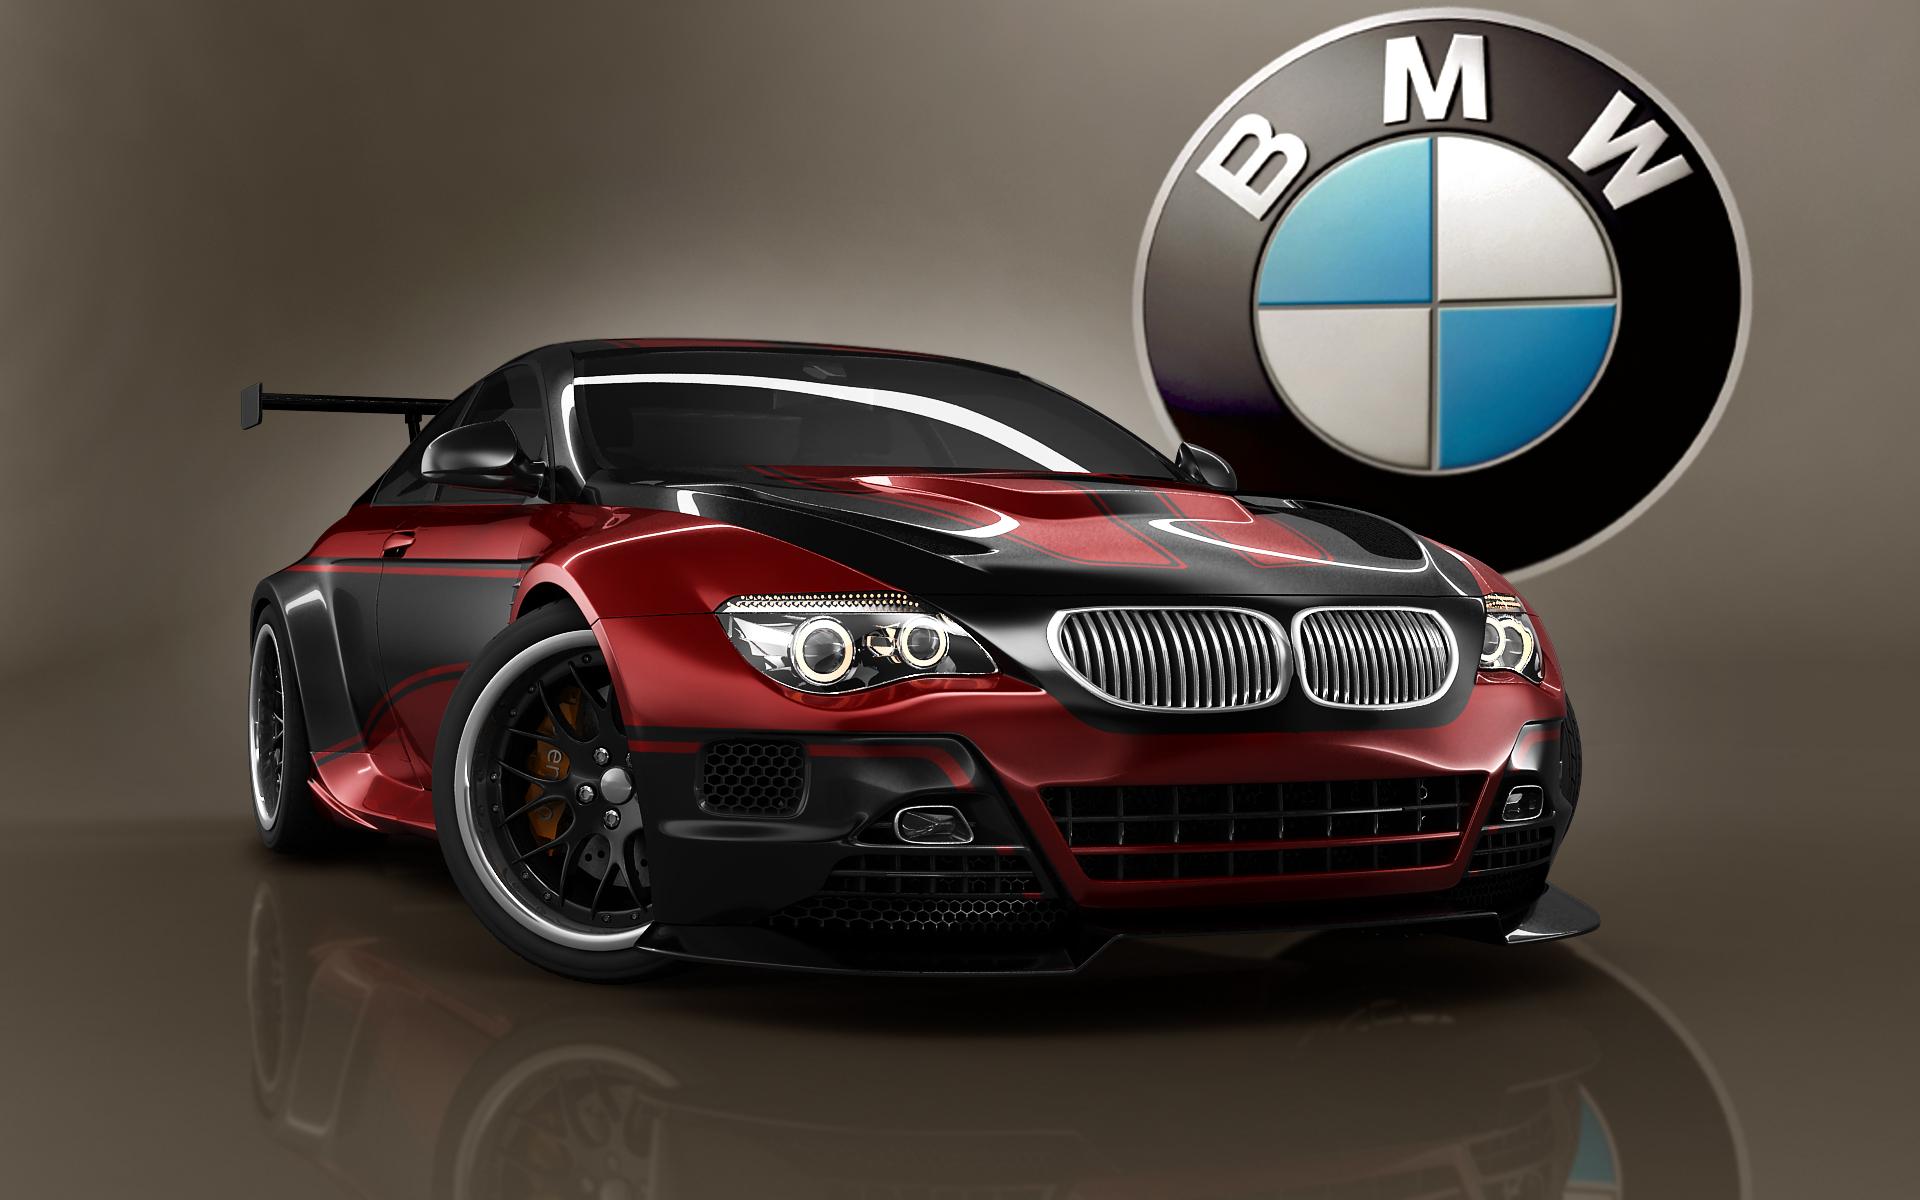 BMW M GT By Stefanmarius On DeviantArt - Bmw cool car